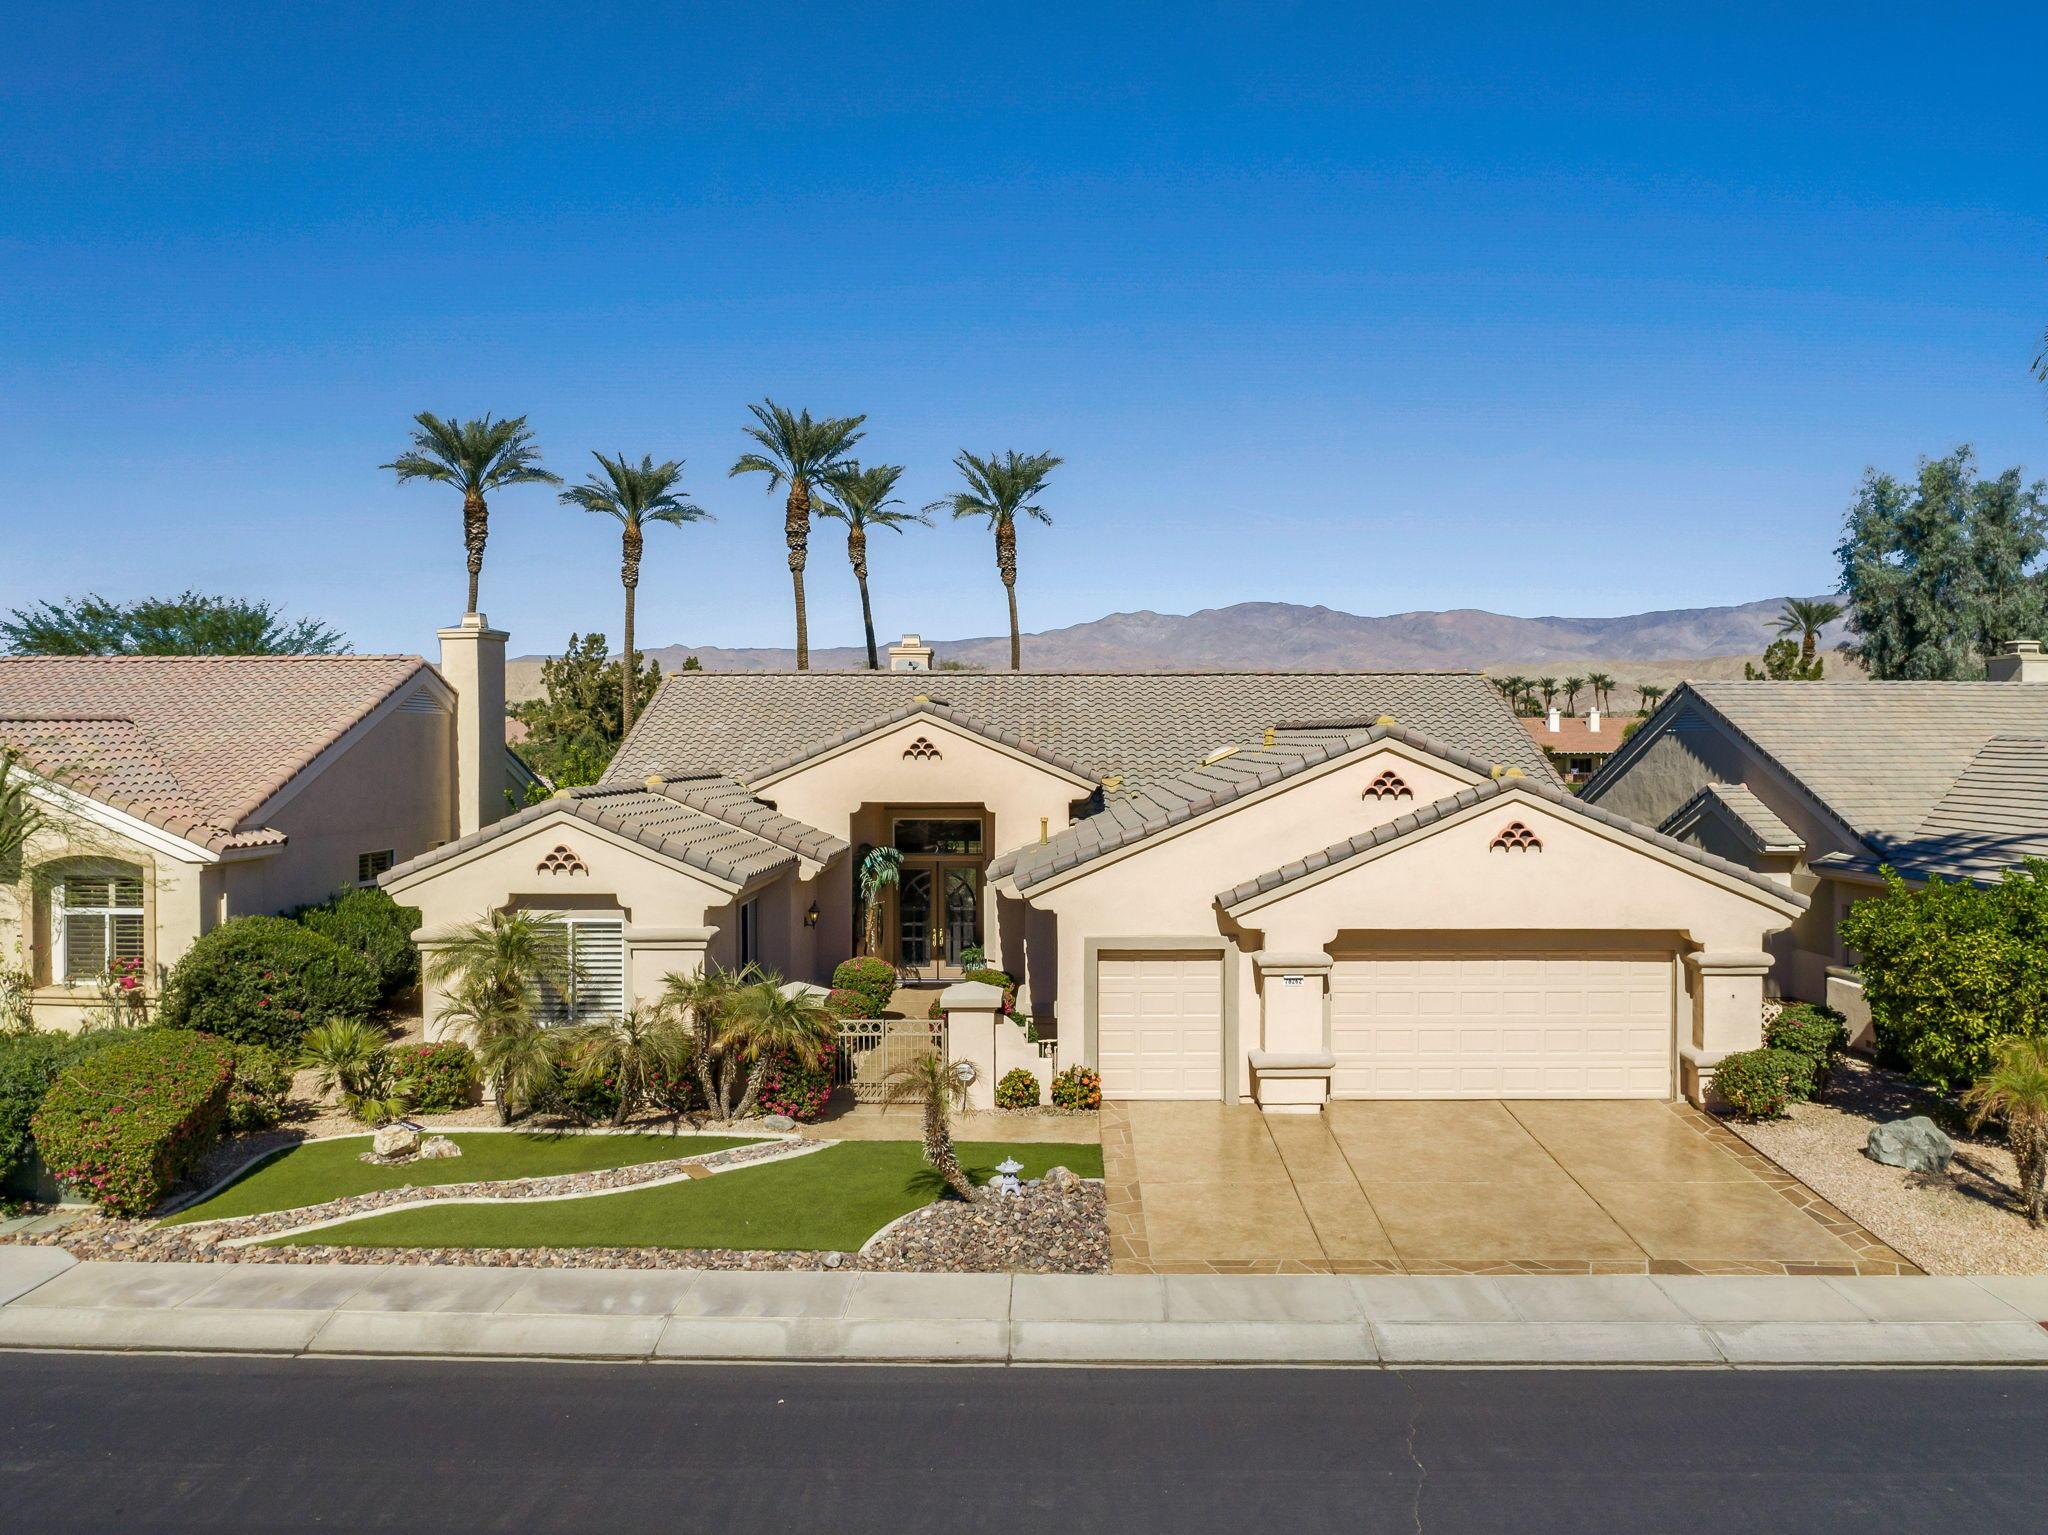 Photo of 78262 Kensington Avenue, Palm Desert, CA 92211